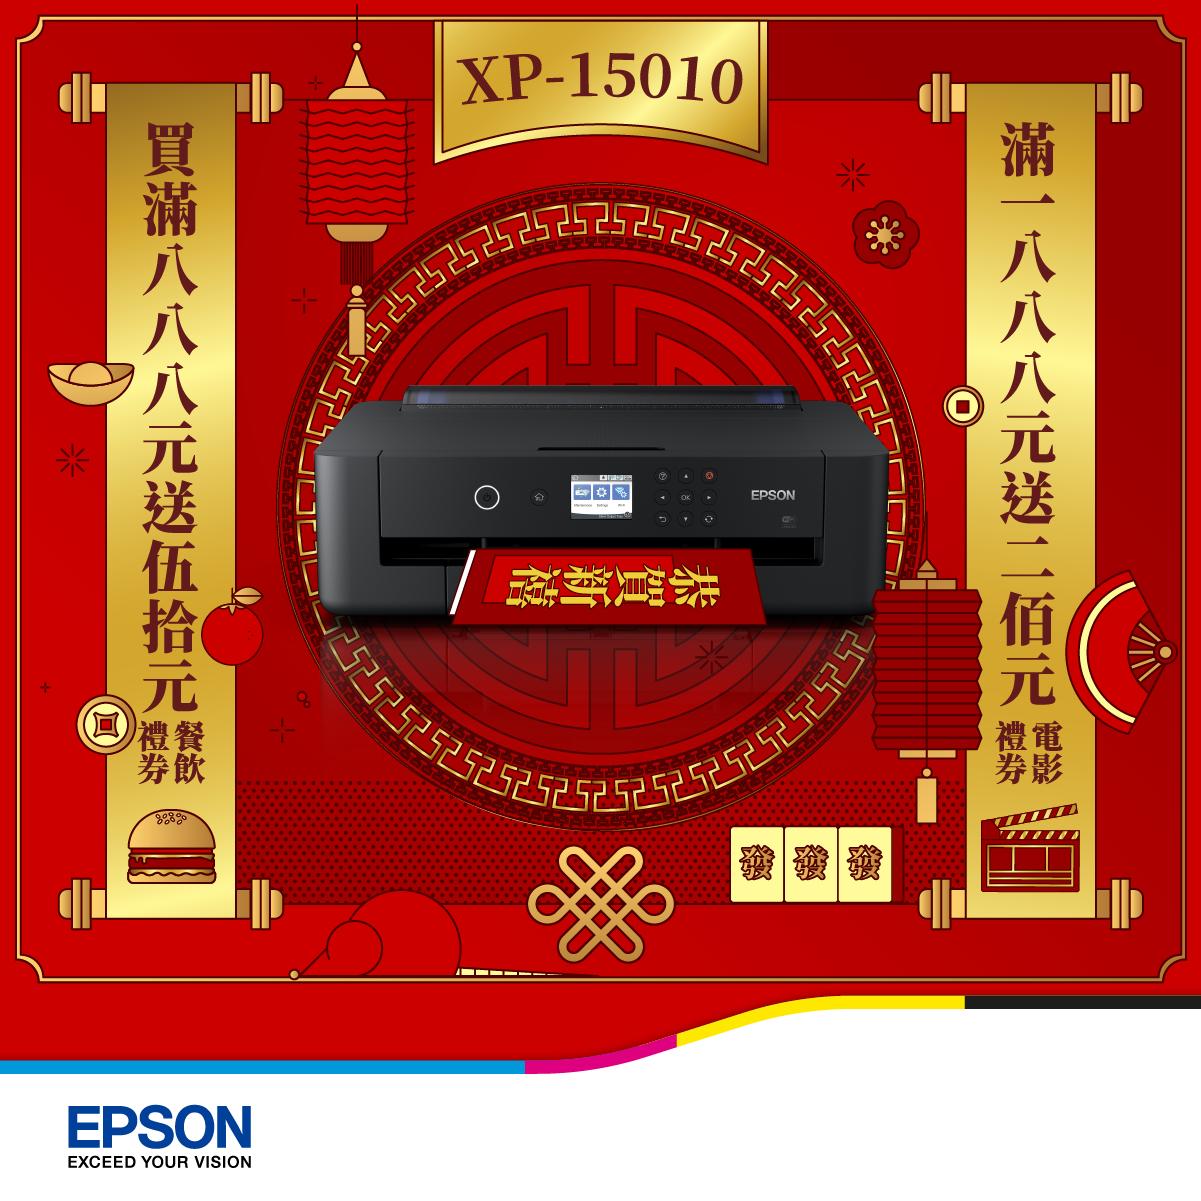 XP-15010